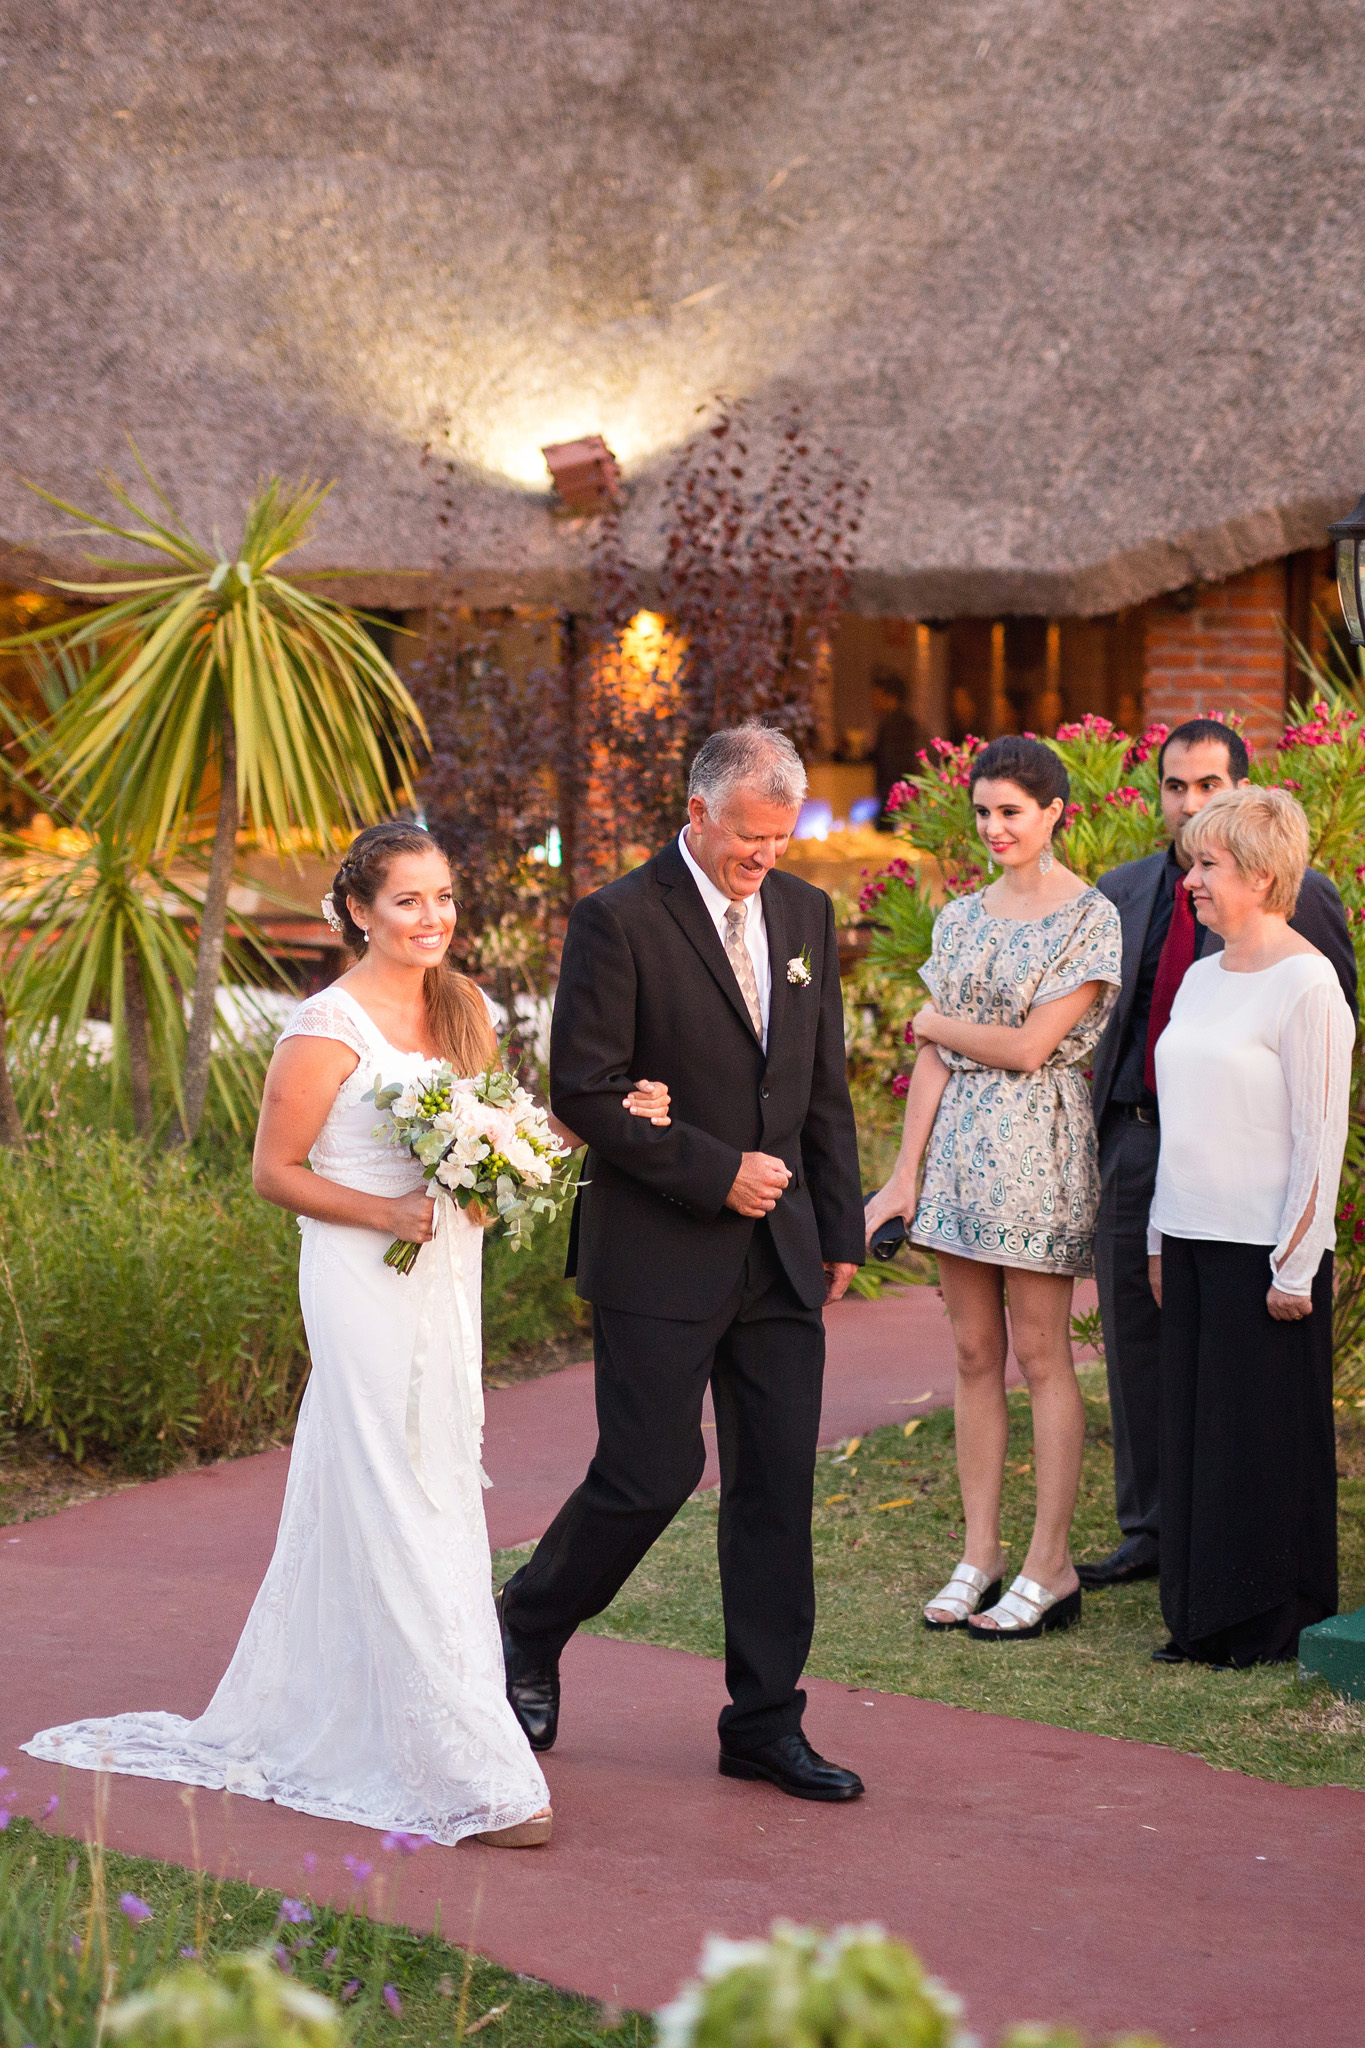 Wedding_Travellers_Destination_Wedding_Photography-40.jpg